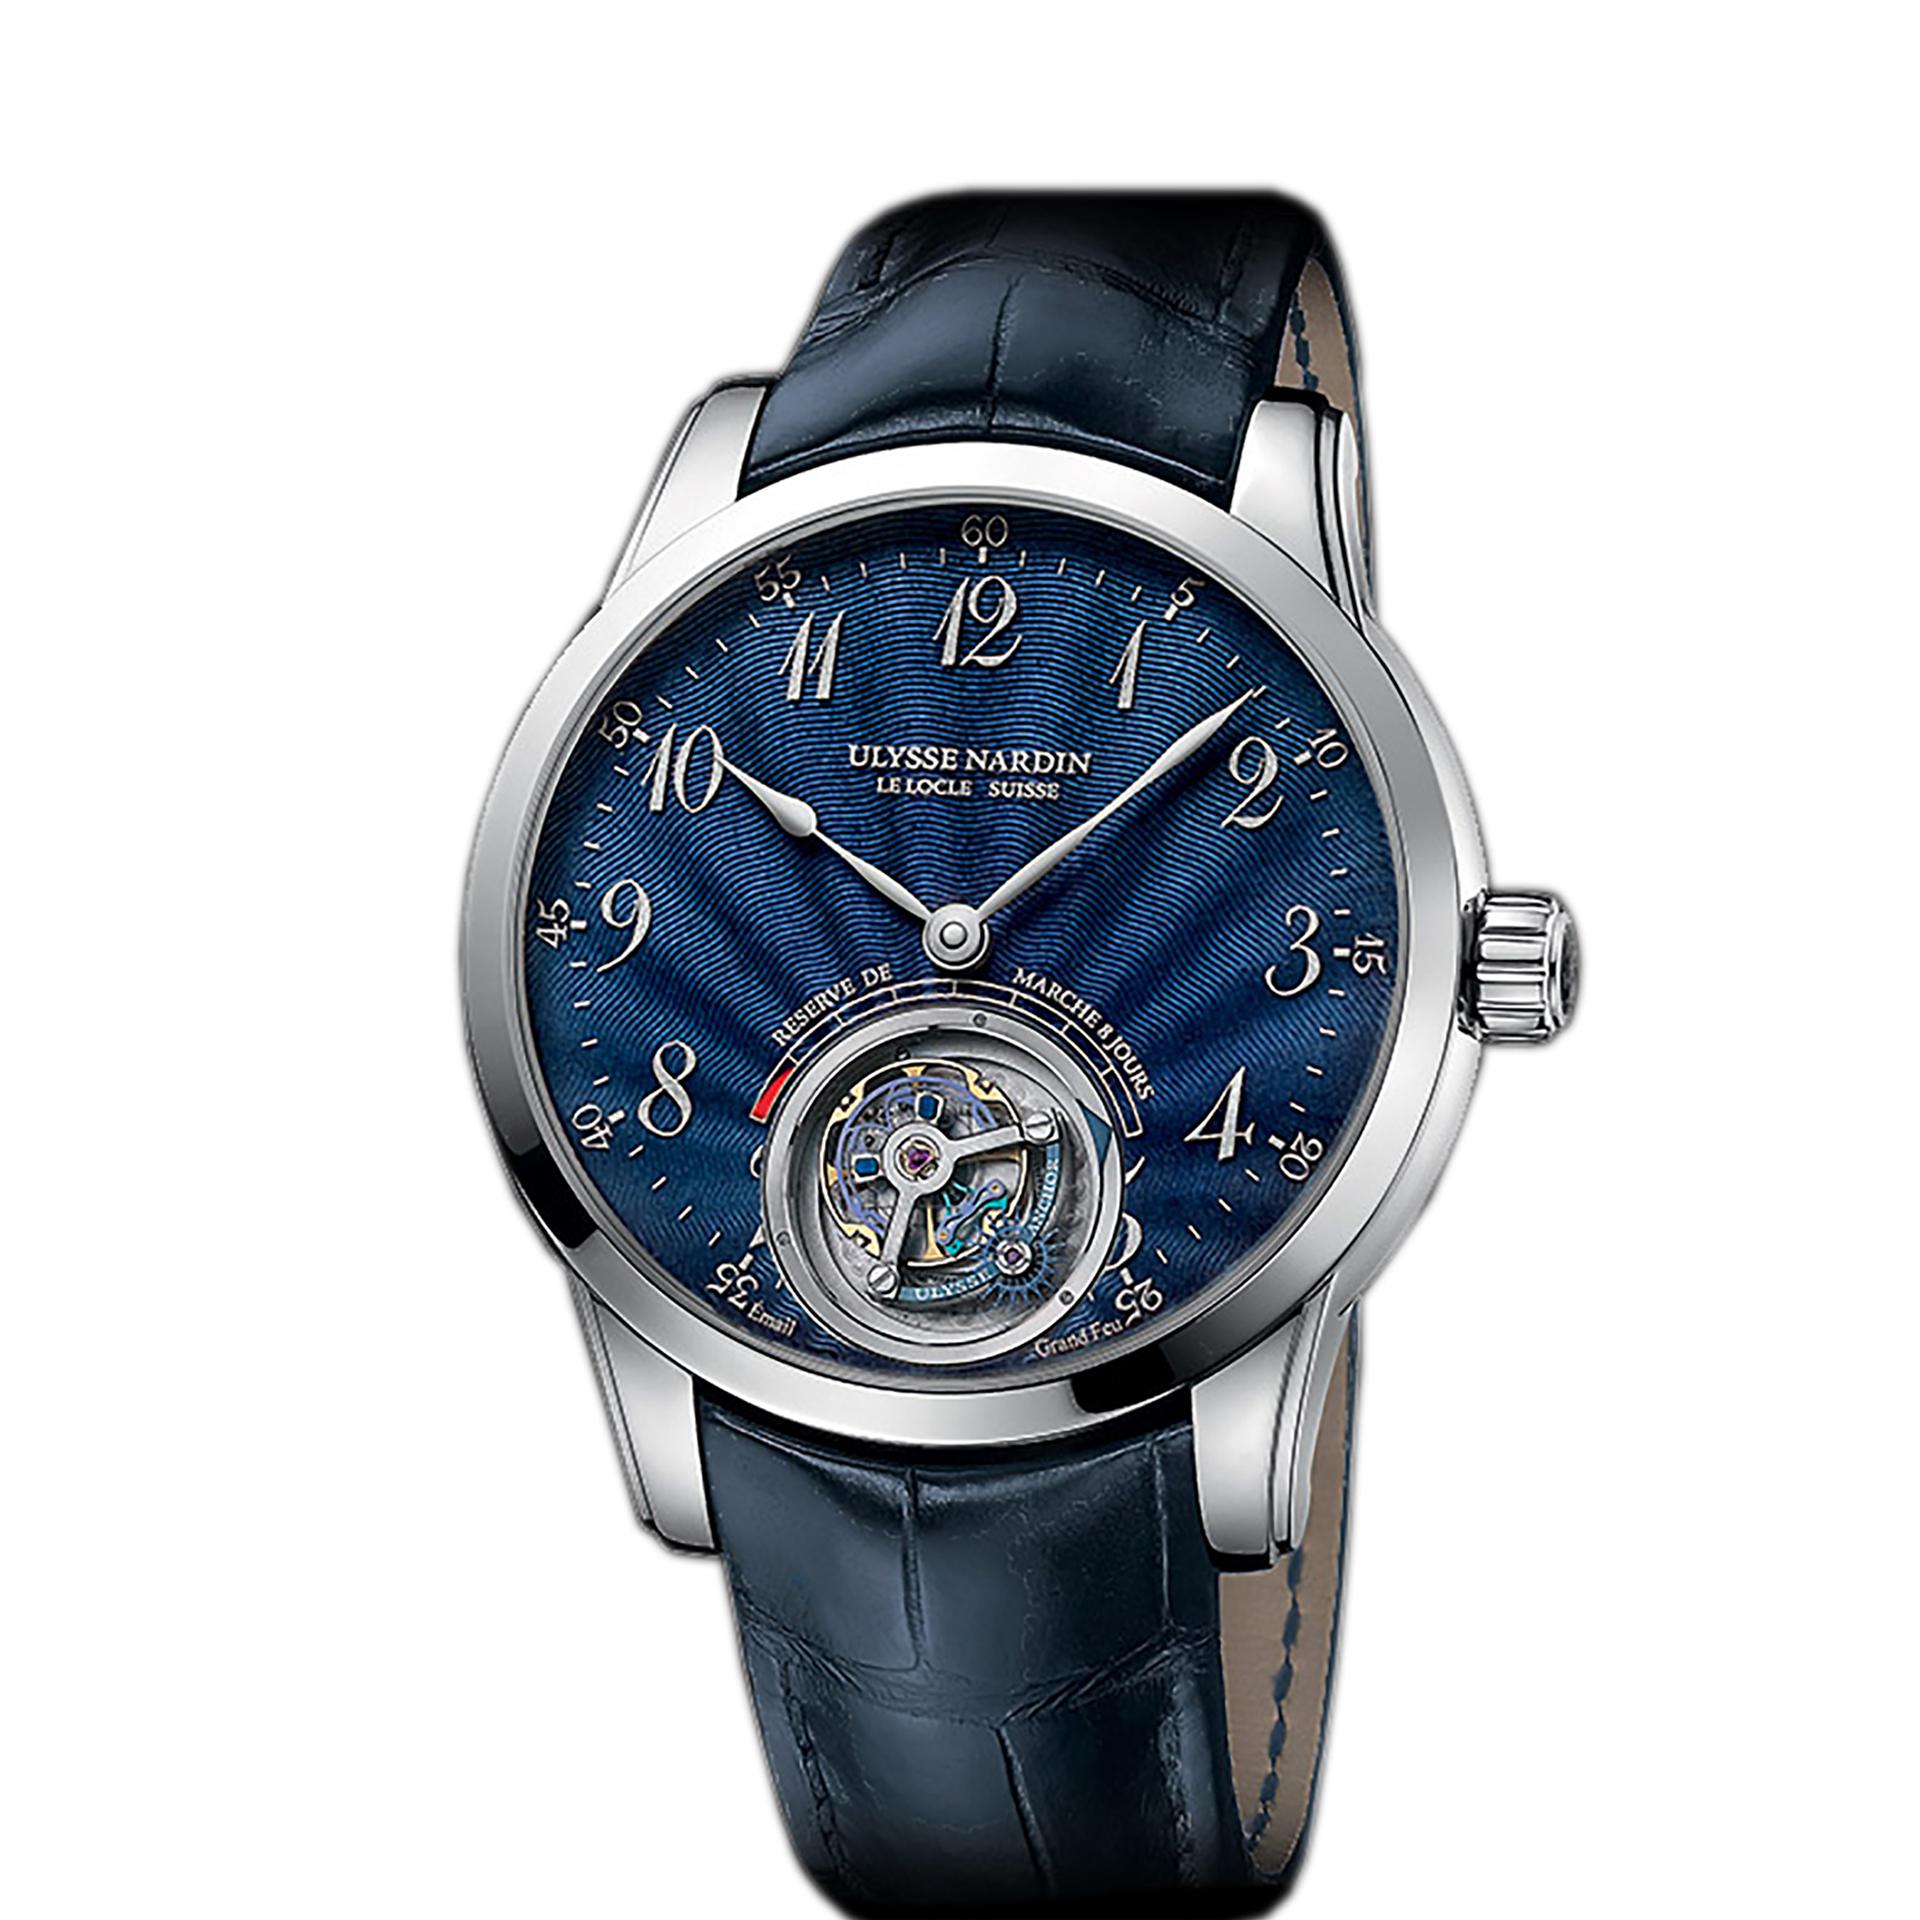 Ulysse Nardin Anchor Tourbillon Blue Enamel Your Watch Hub